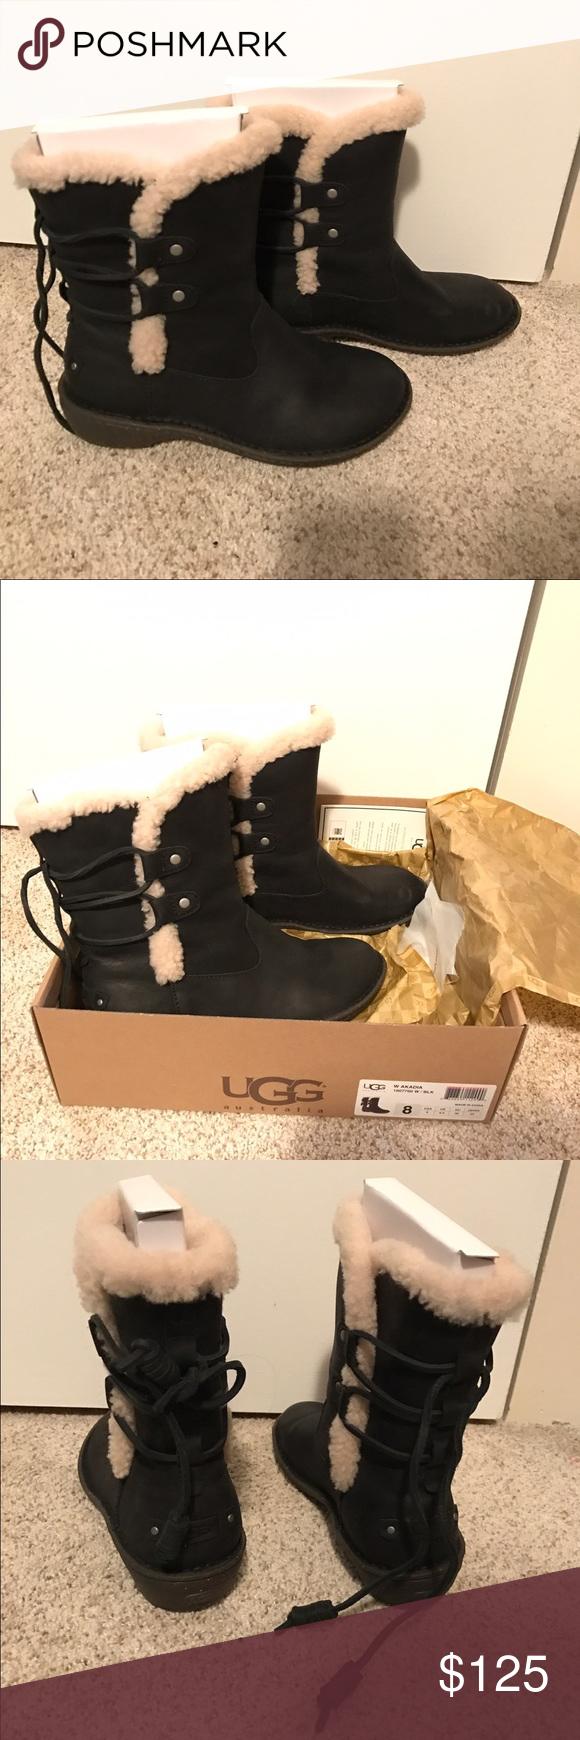 e5bdcf28969 UGG Akadia sheepskin lace-up boot UGG Australia Akadia genuine ...